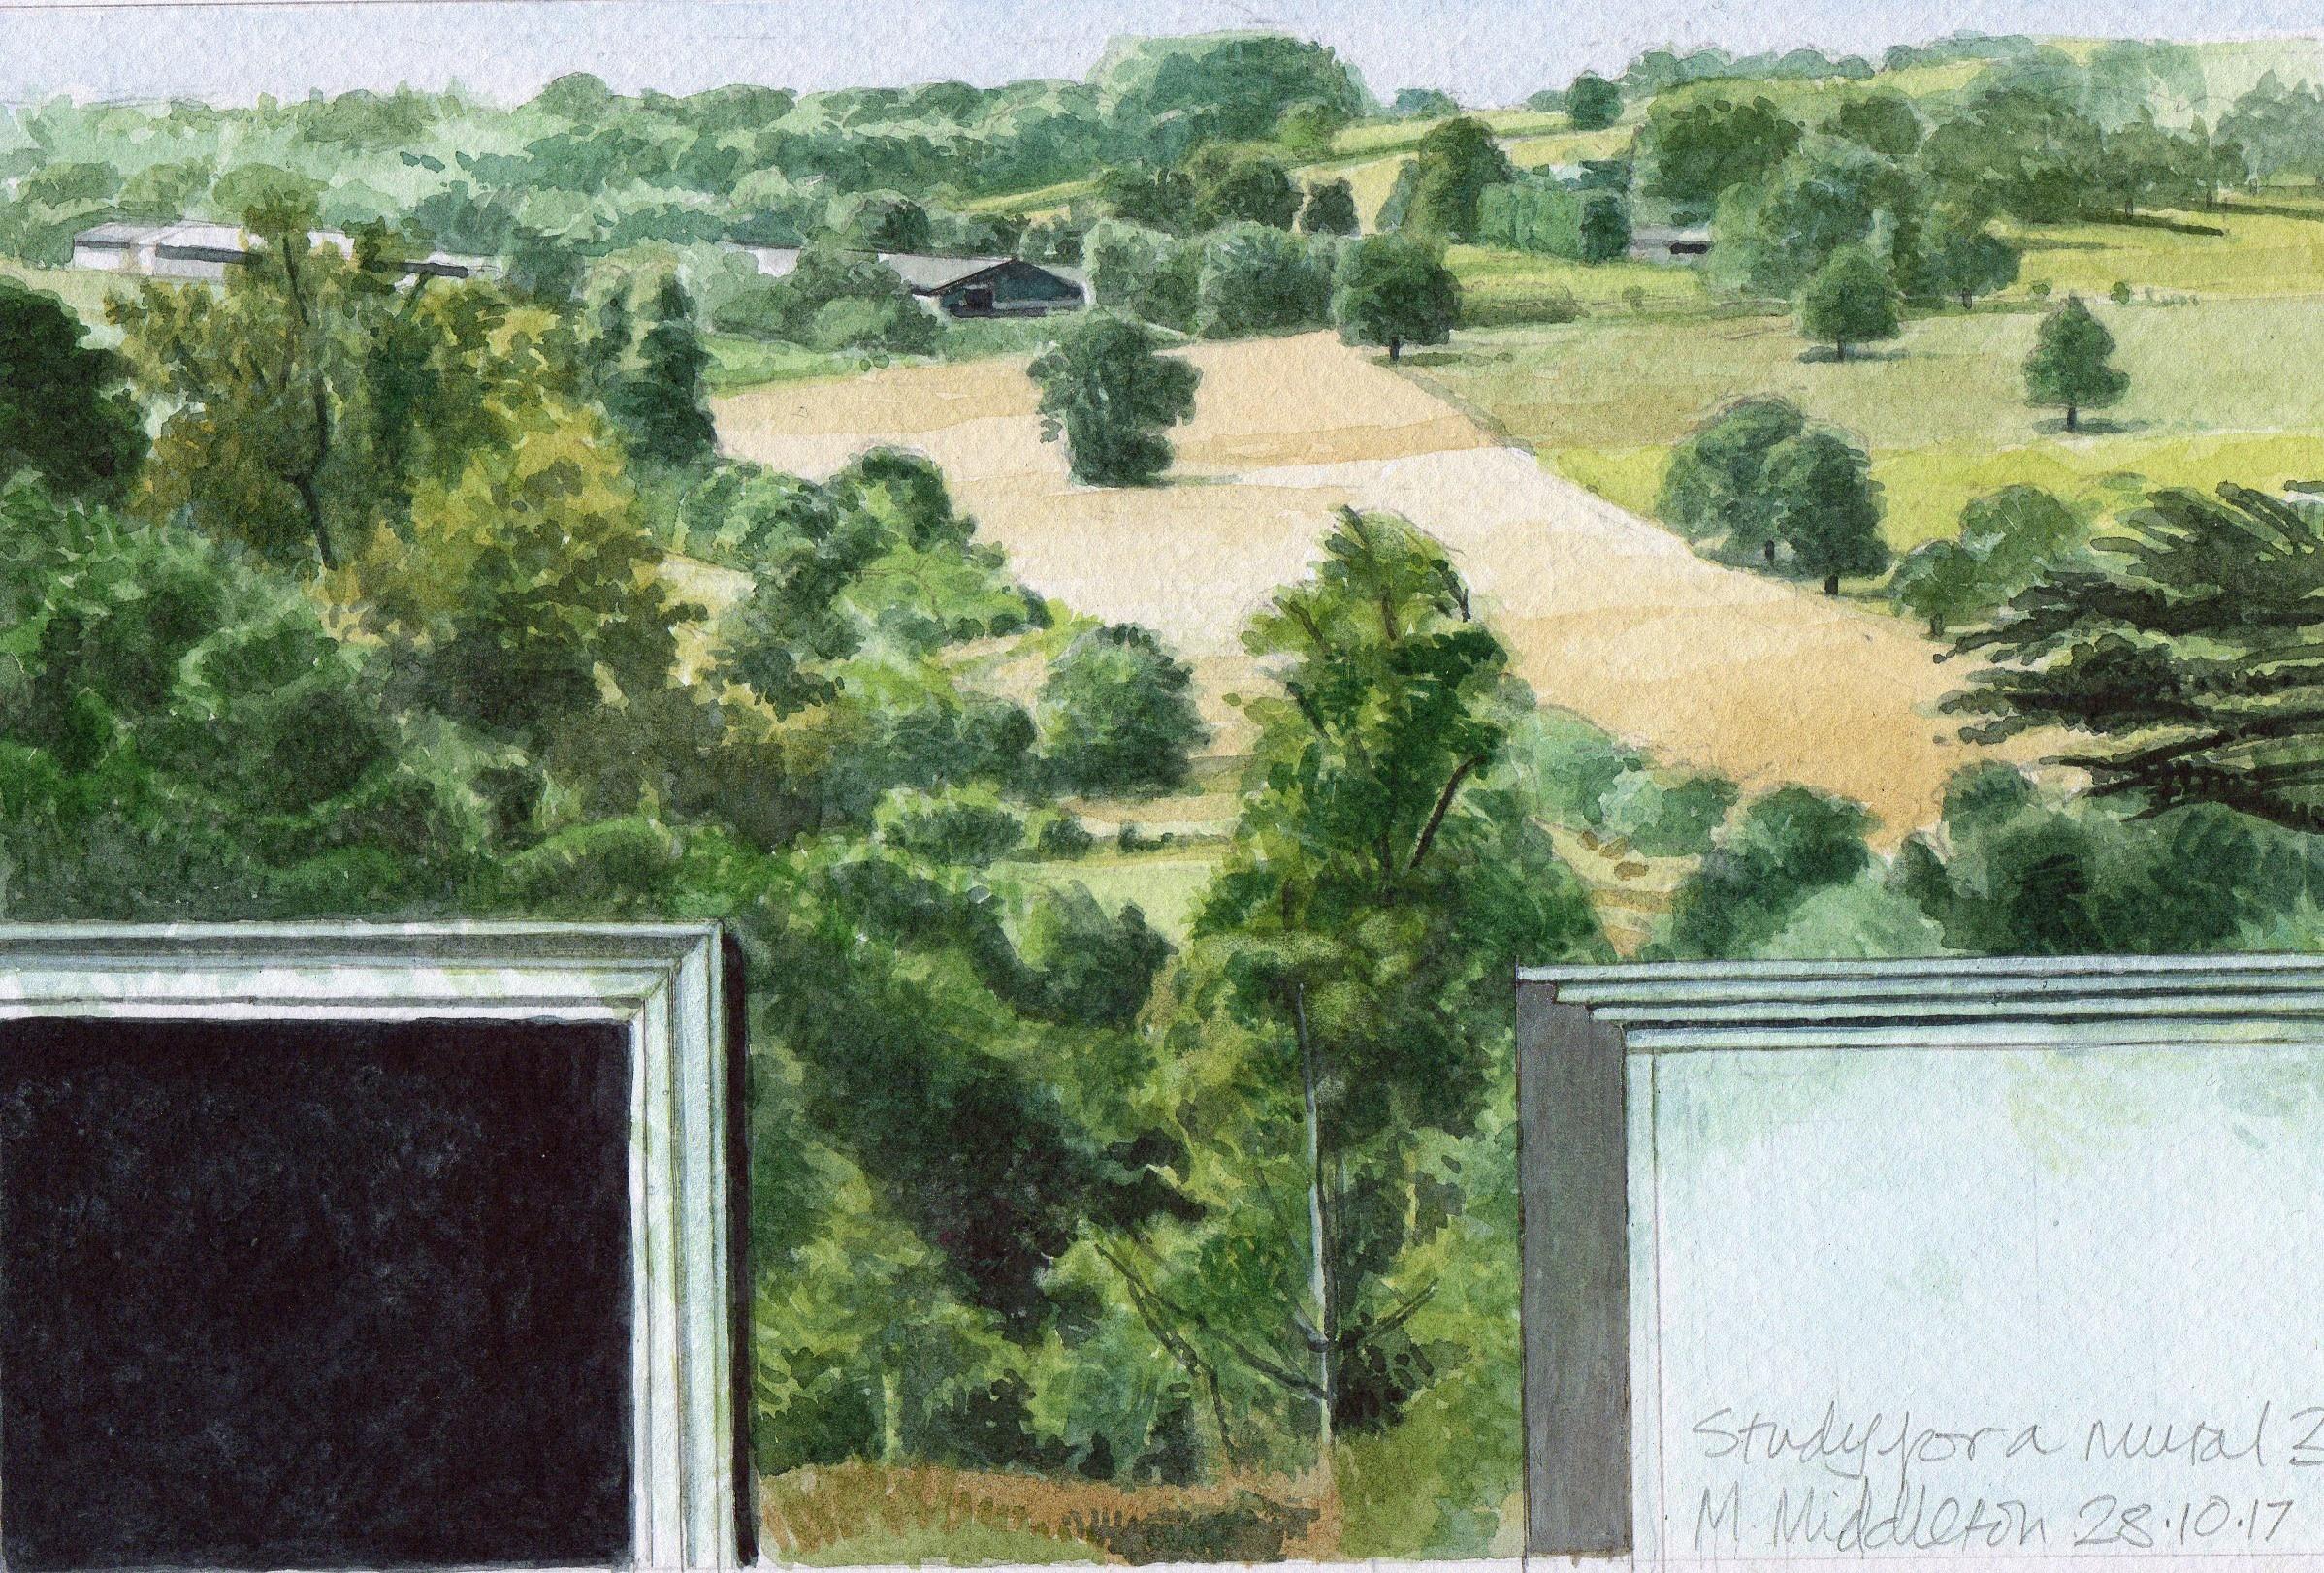 <span class=&#34;link fancybox-details-link&#34;><a href=&#34;/exhibitions/24/works/artworks_standalone10749/&#34;>View Detail Page</a></span><div class=&#34;artist&#34;><span class=&#34;artist&#34;><strong>Michael Middleton</strong></span></div><div class=&#34;title&#34;><em>Study for a Mural</em></div><div class=&#34;medium&#34;>watercolour</div><div class=&#34;dimensions&#34;>32x28cm</div>